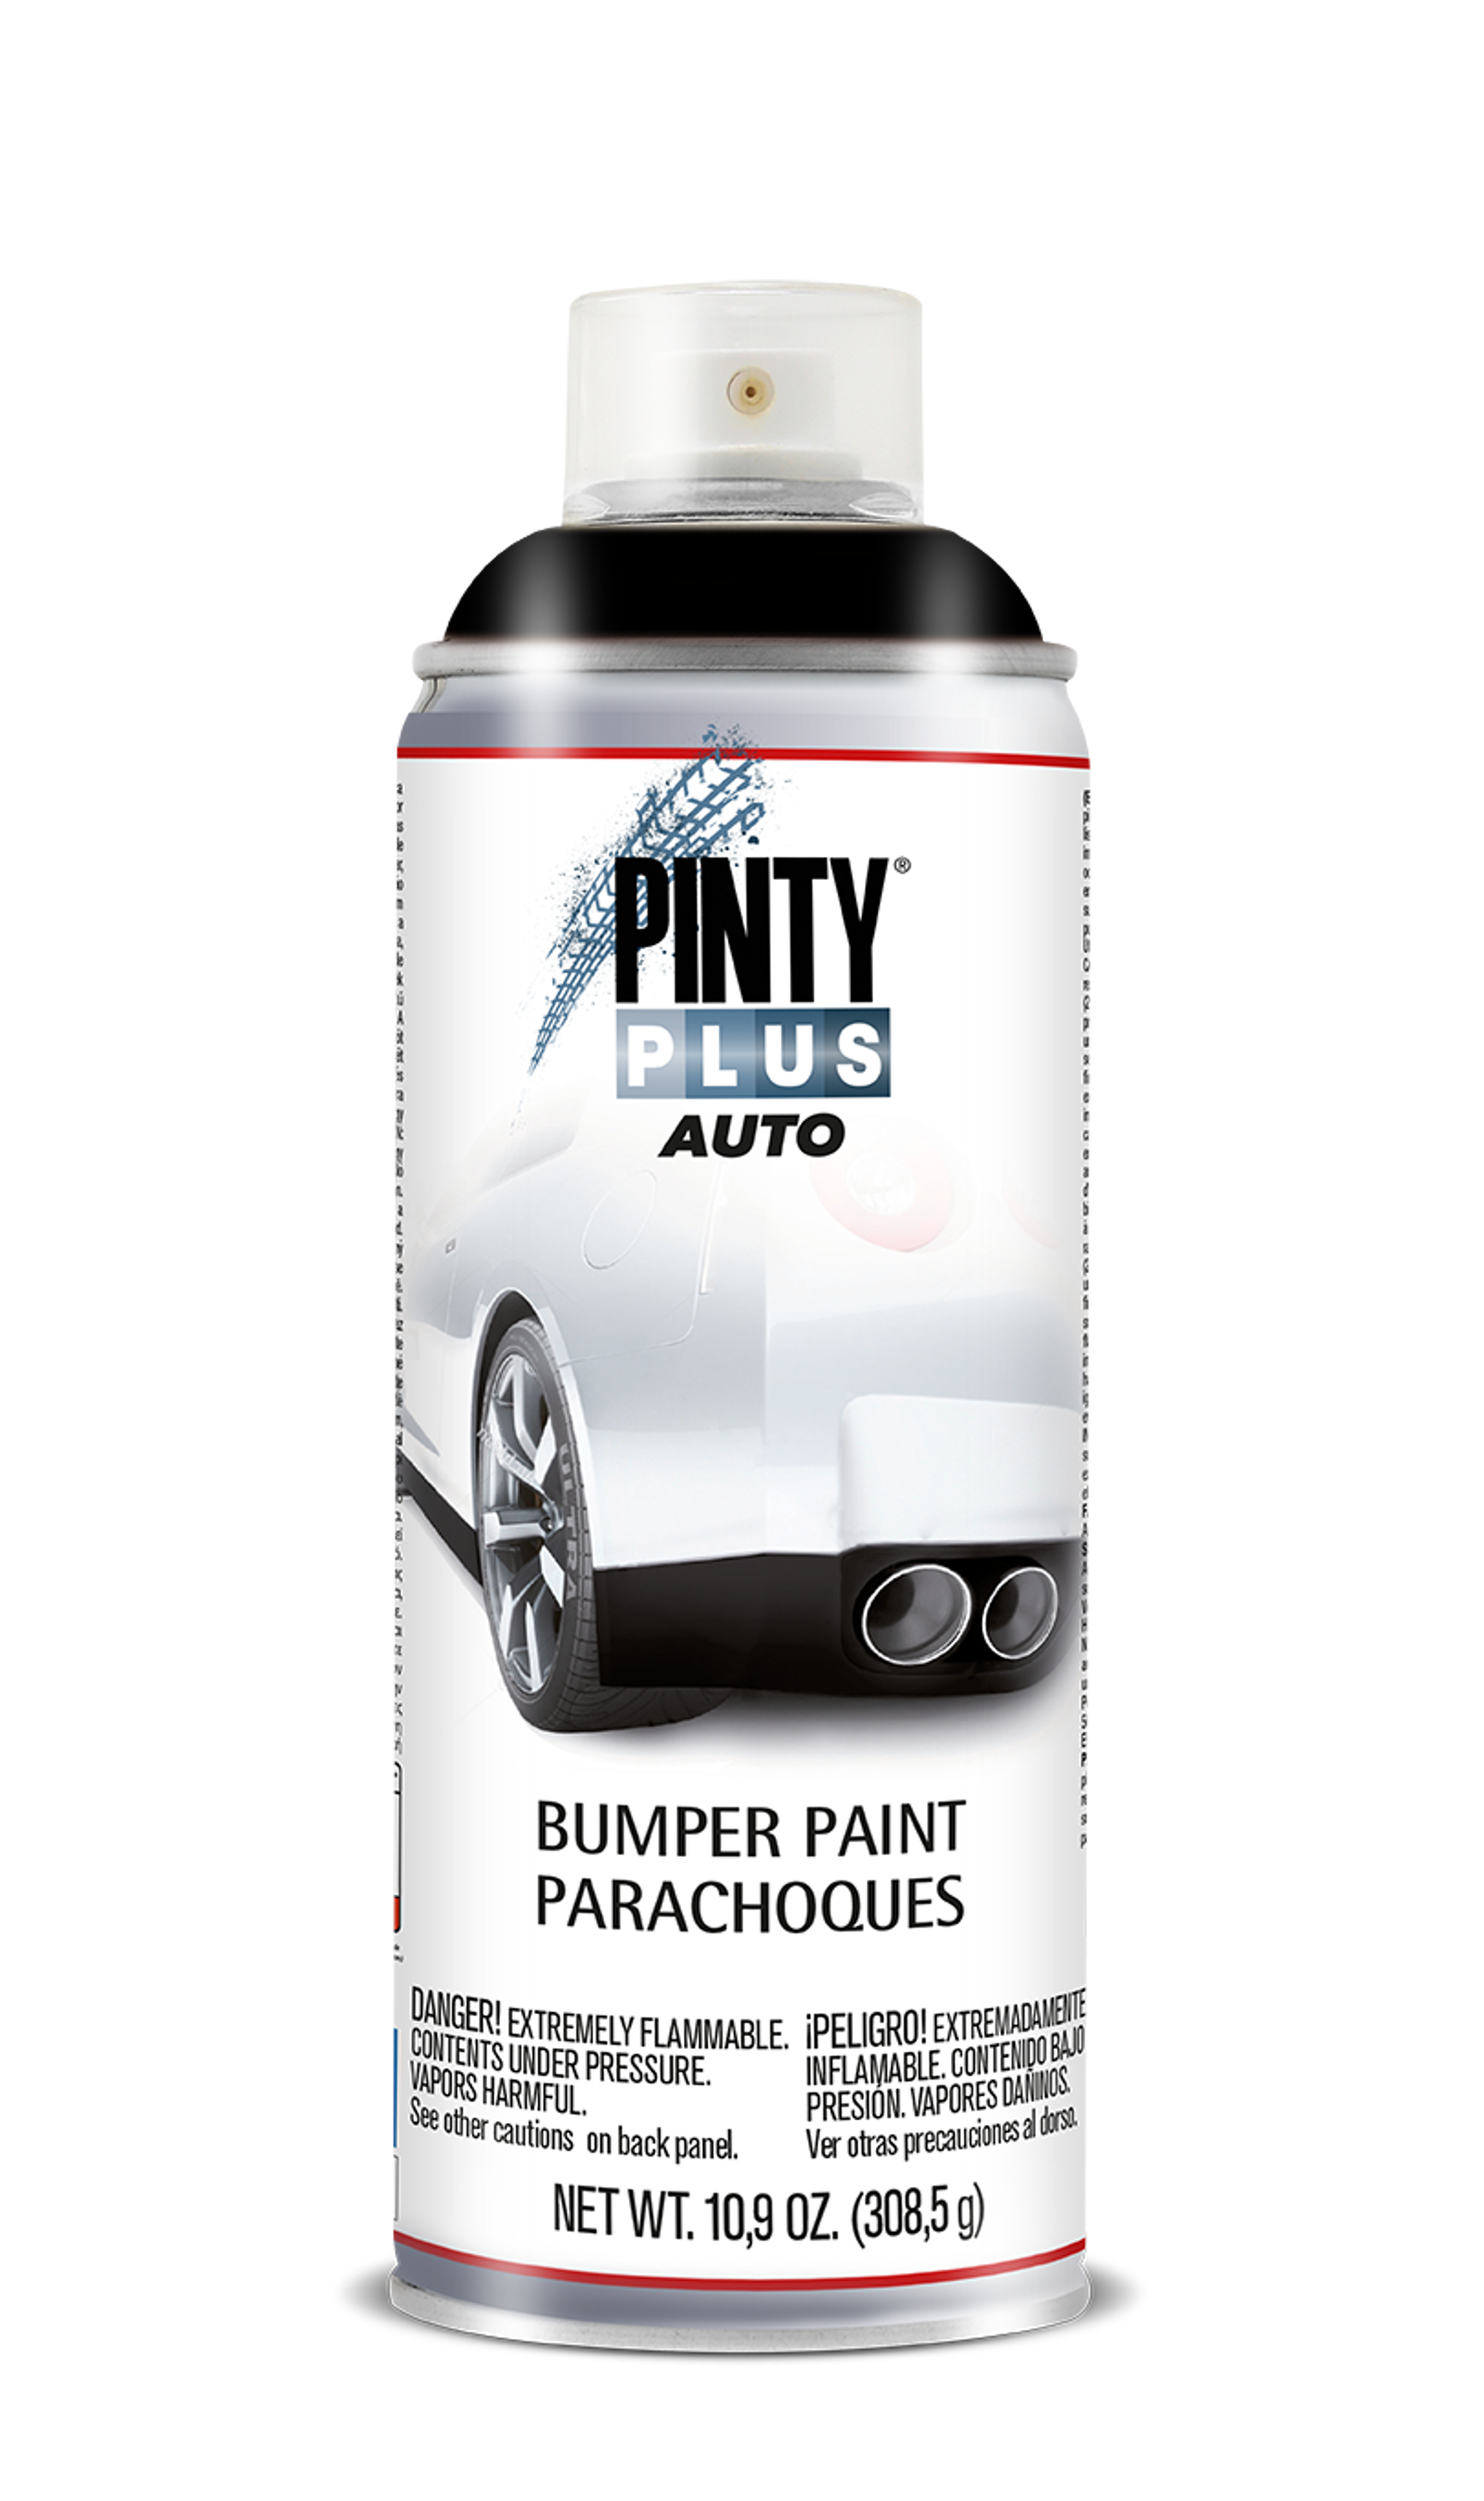 Bumper spray paint Pintyplus Auto